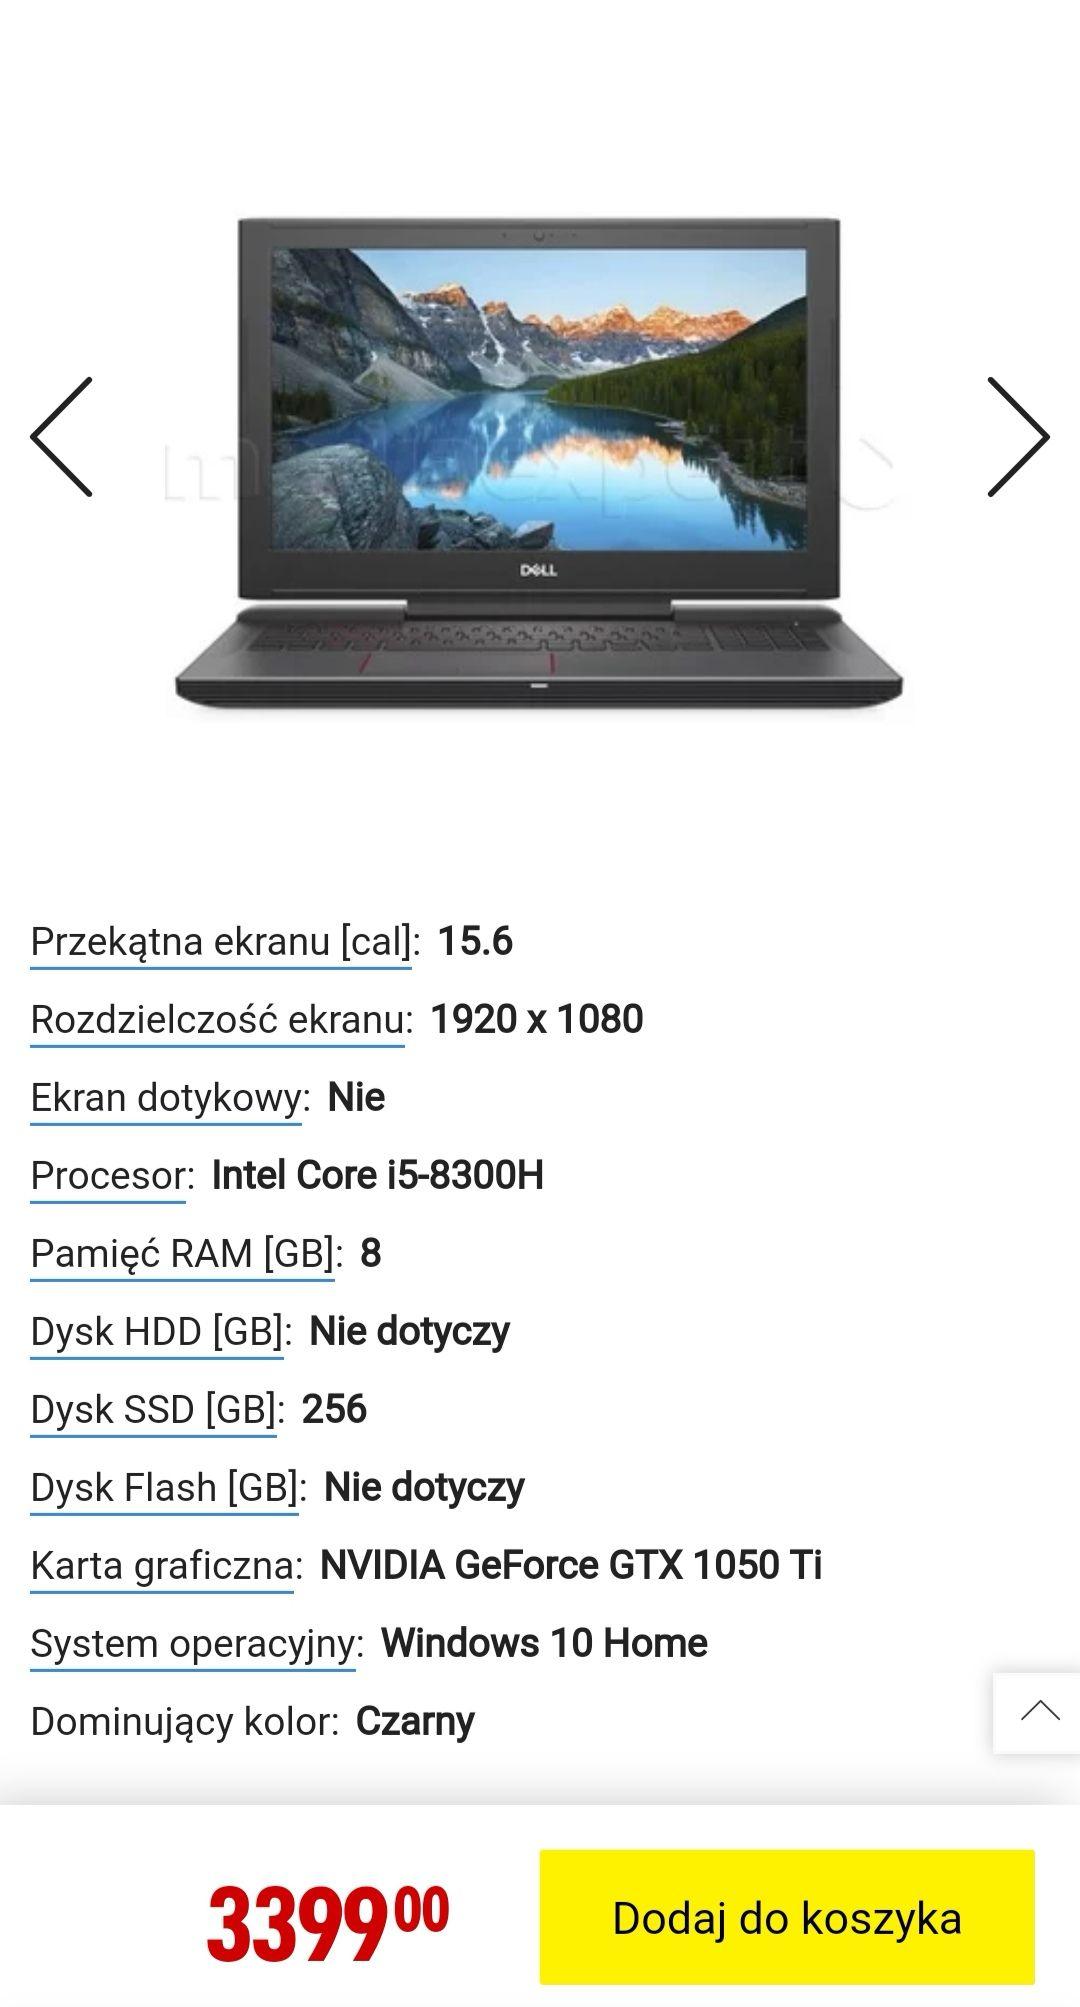 Laptop DELL Inspiron 15 G5 (5587-7482) i5-8300H 8GB 256 GB SSD GF-GTX1050 Ti W10